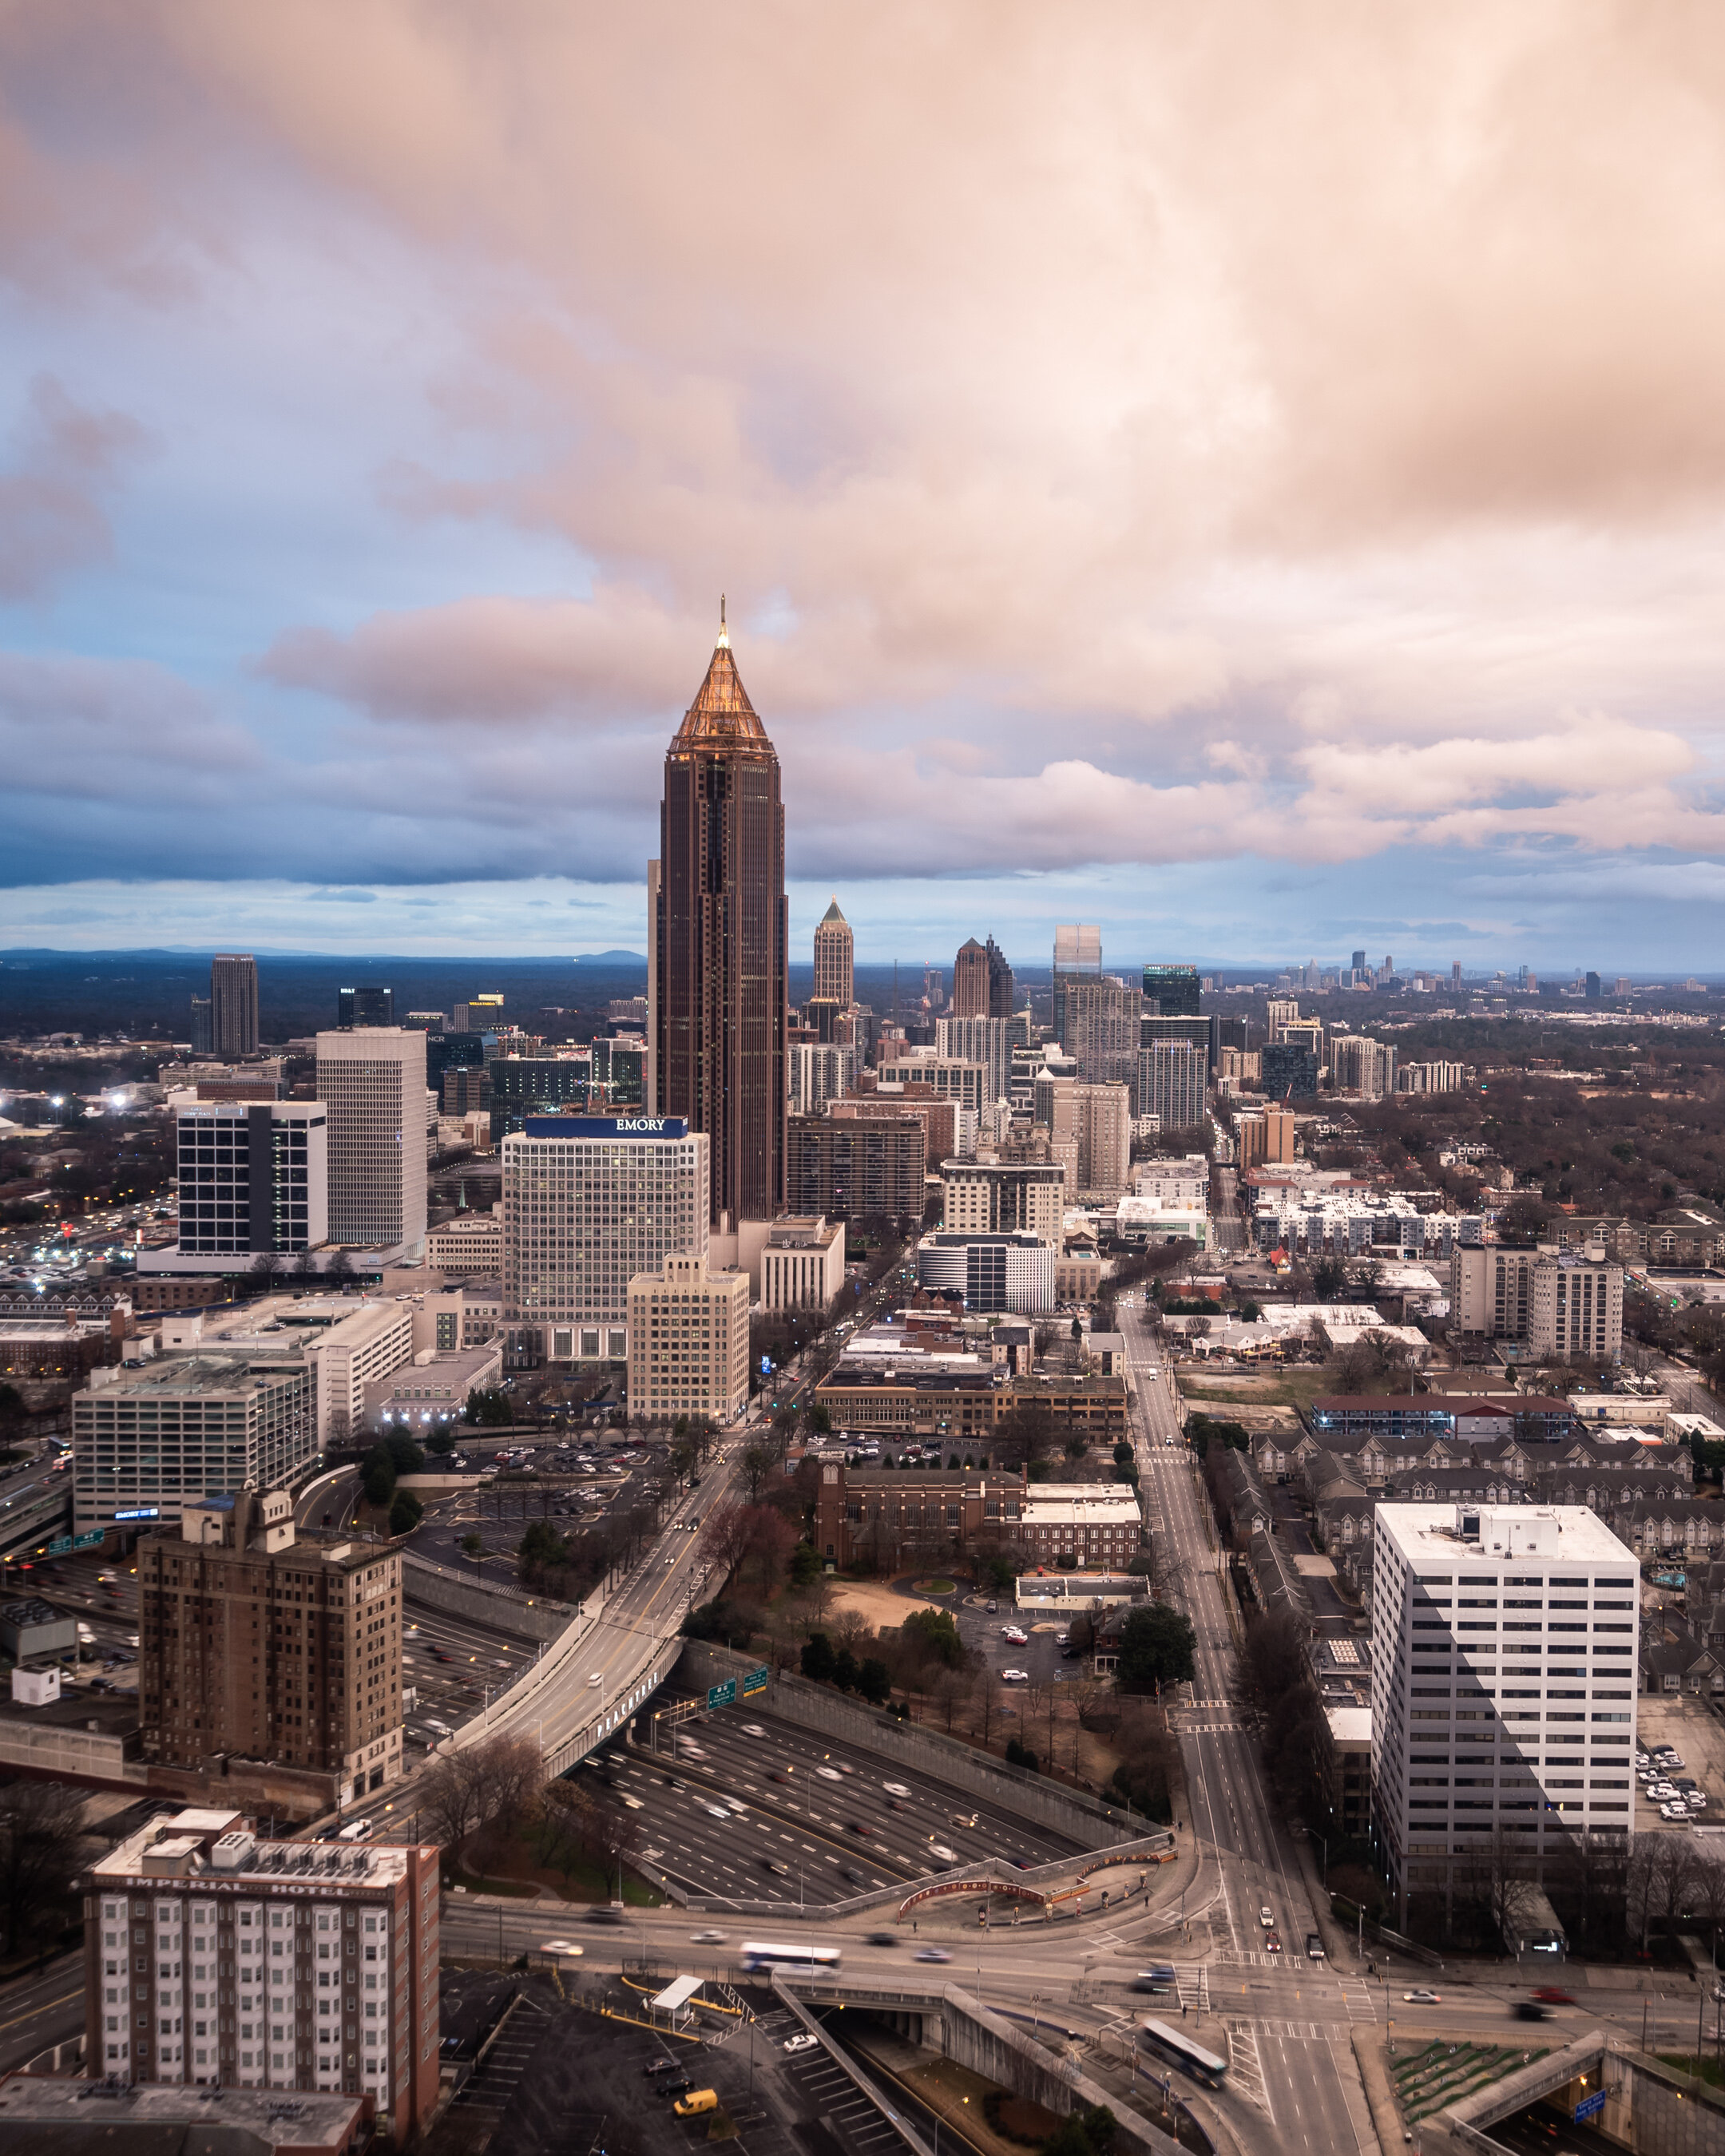 Atlanta North Skyline Bank of America Sunrise Top of Marriott Marquis